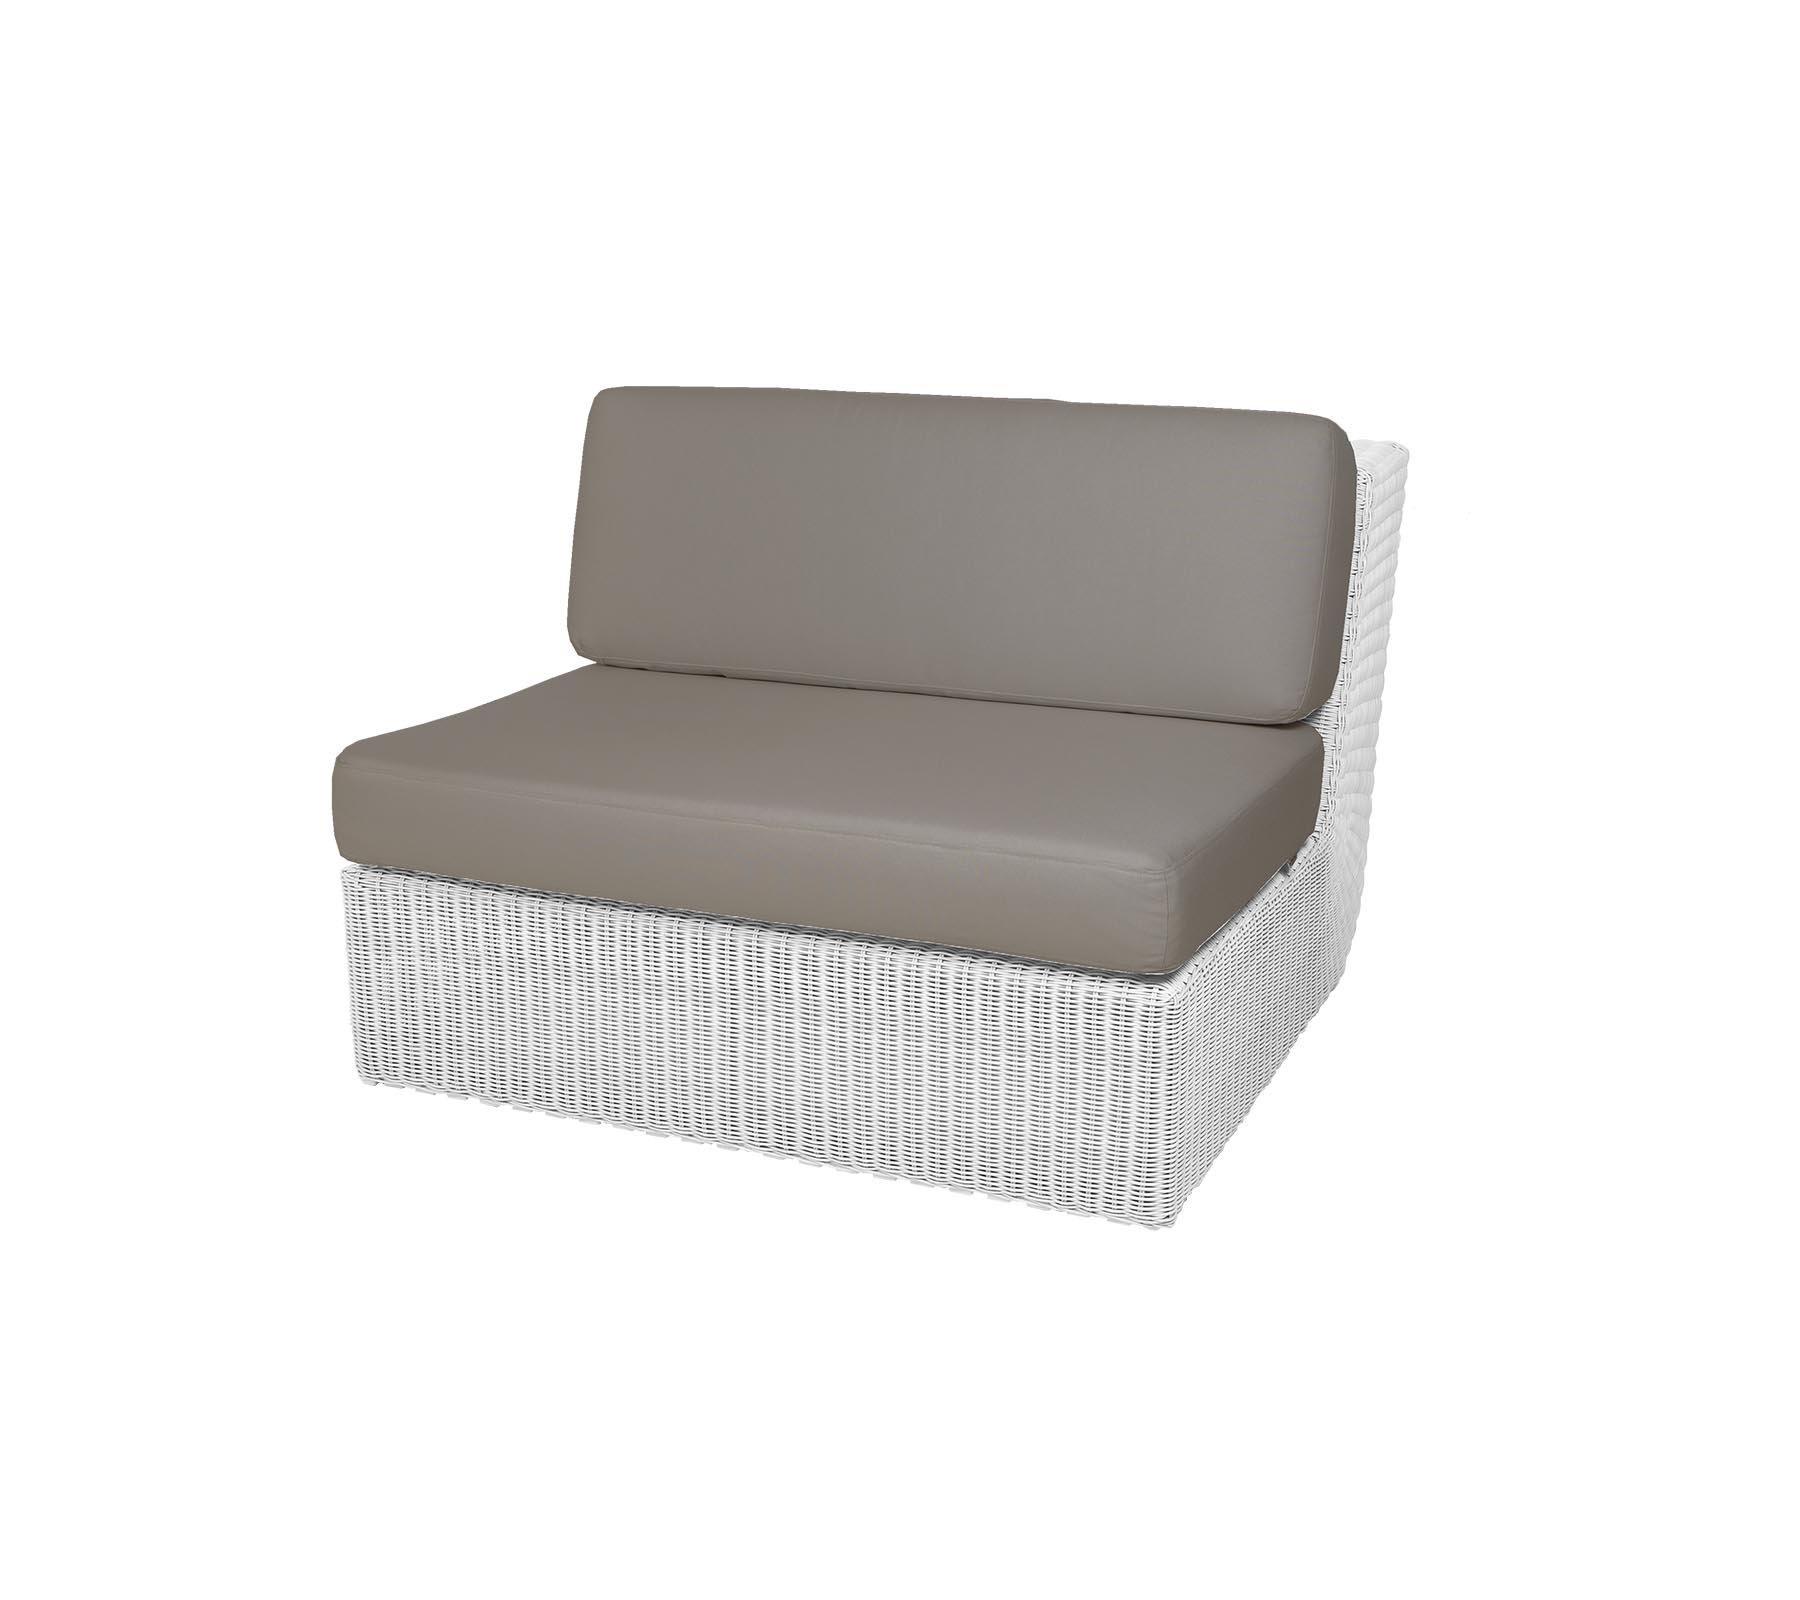 Savannah Single Seat Module Sofa modular from Cane-line